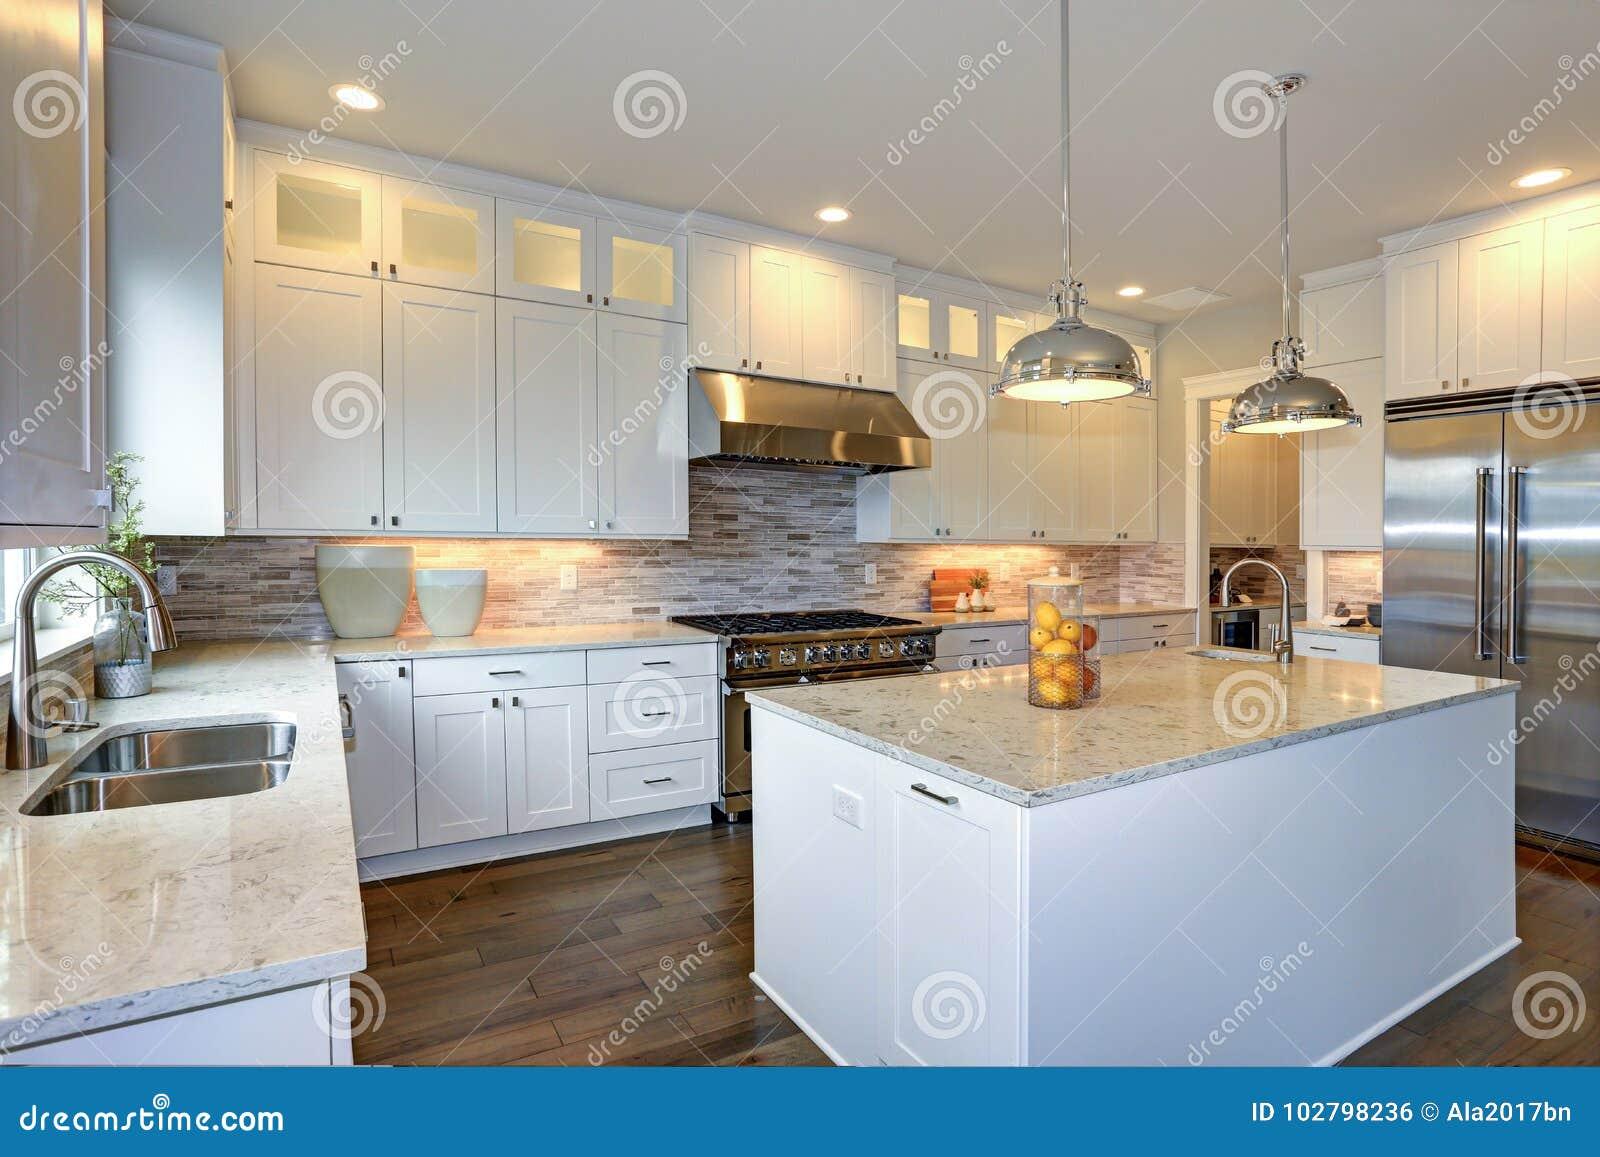 Luxury White Kitchen With Large Kitchen Island. Stock Photo ...